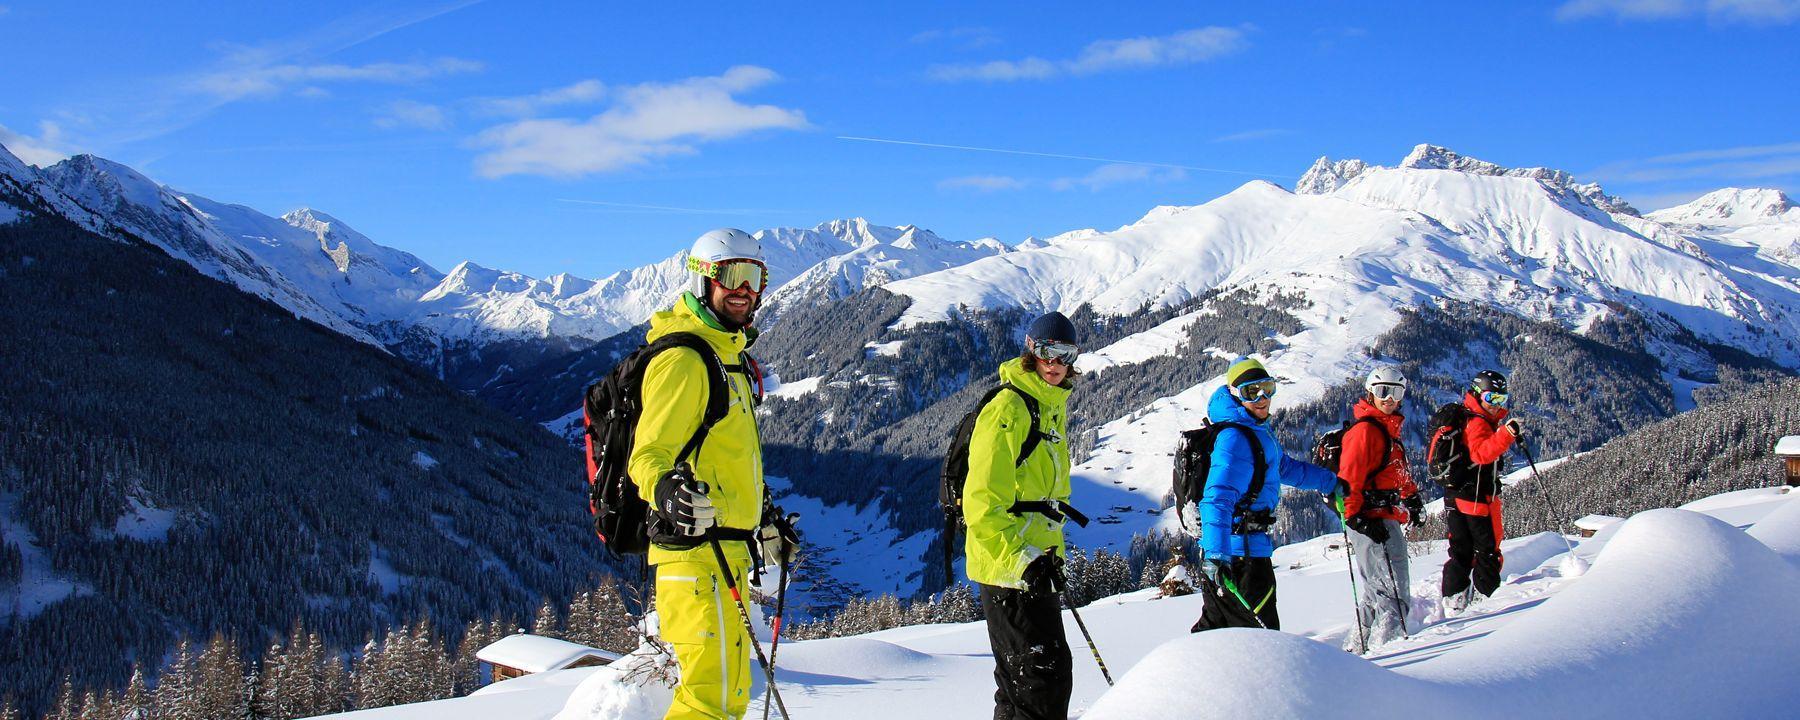 Skimountaineering/Skicrossing Group - Beginner